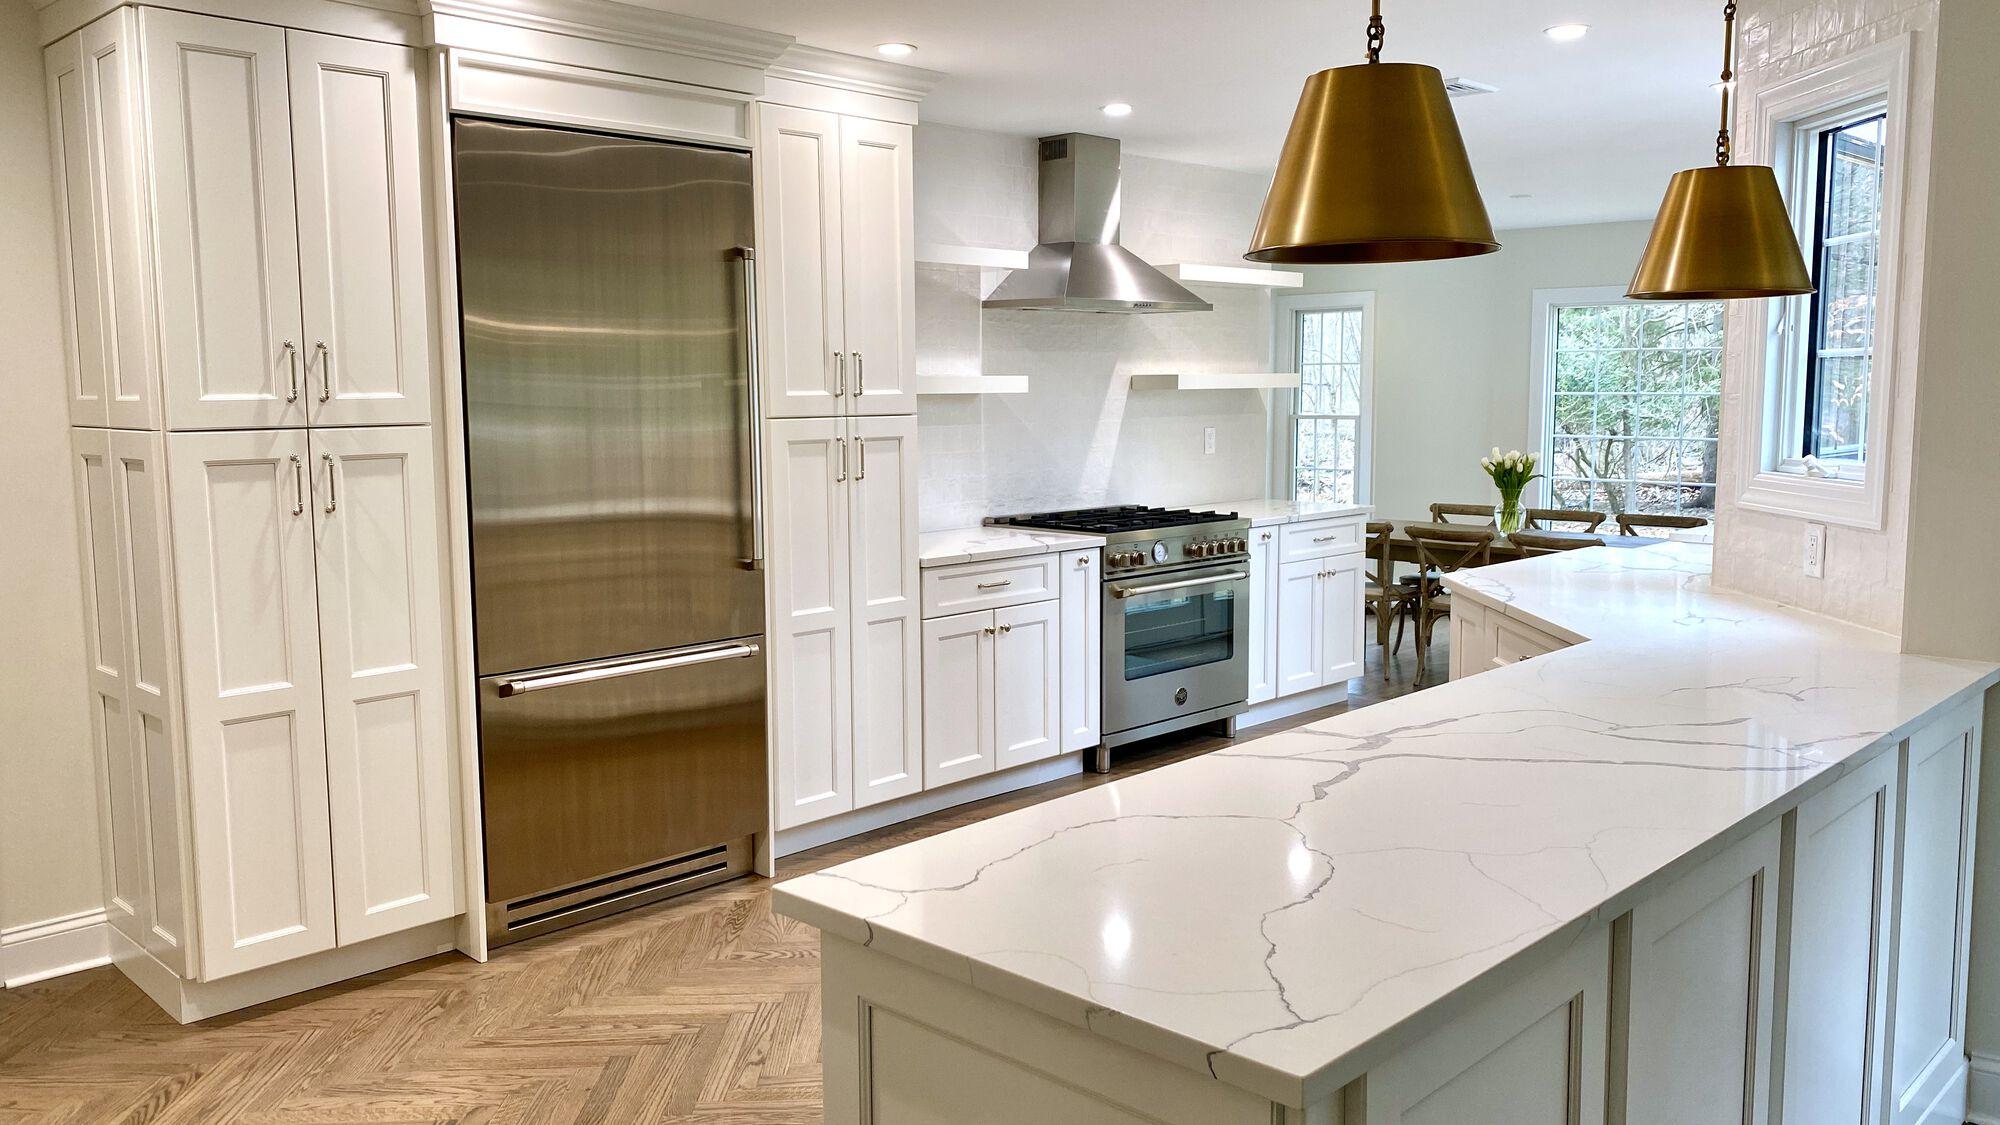 Open Concept Modern Kitchen with White Shaker Cabinetry, Open Shelving, Herringbone Oak Flooring, Calacatta Quartz Counters, Kohler Fixtures, Andersen Windows in Ramsey, Bergen County NJ